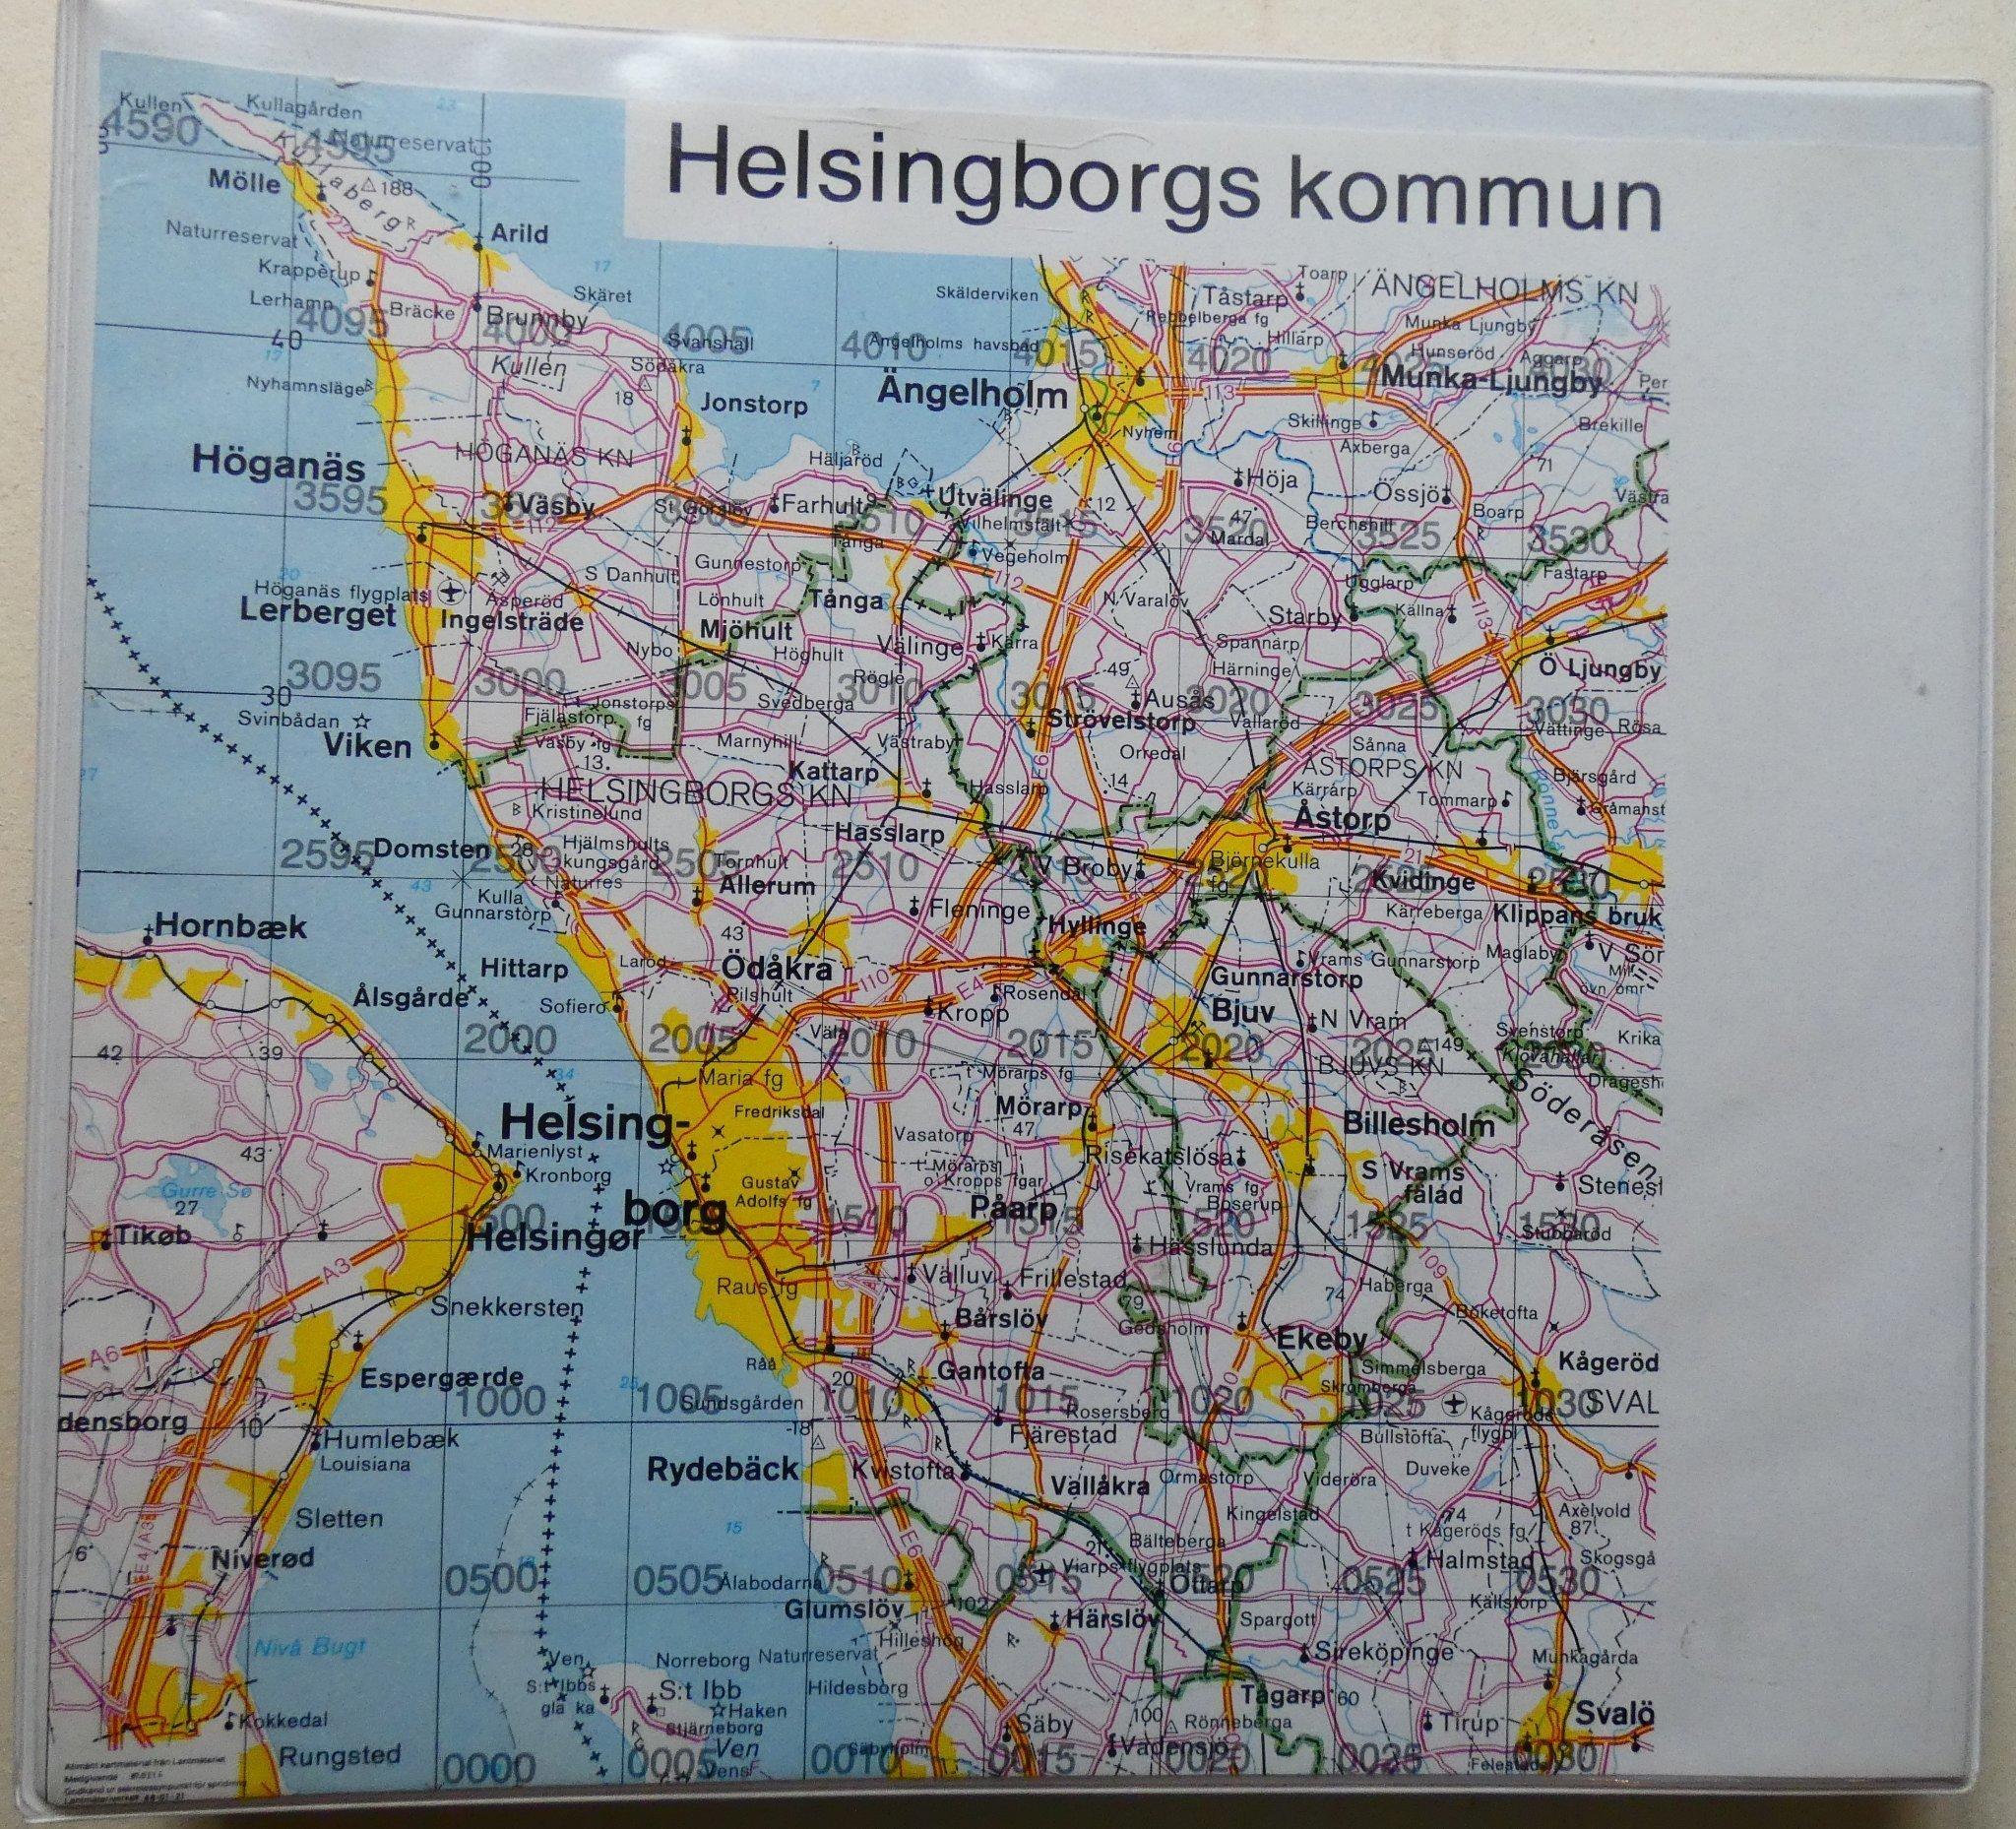 Kartor I Parm Over Helsingborgs Kommun 379361124 ᐈ Kop Pa Tradera